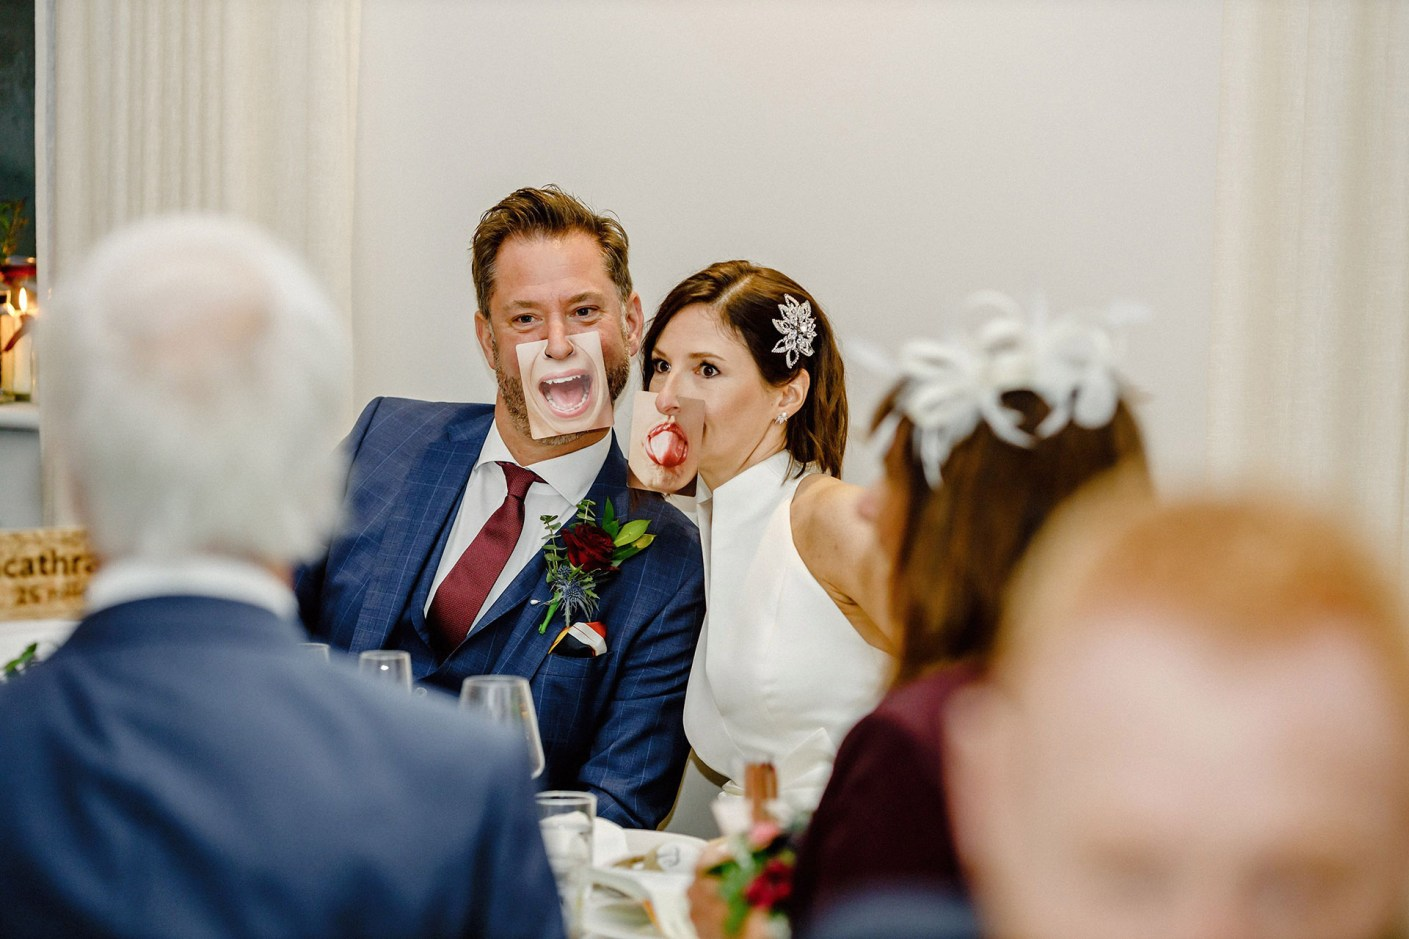 windermere wedding reception, linthwaite house